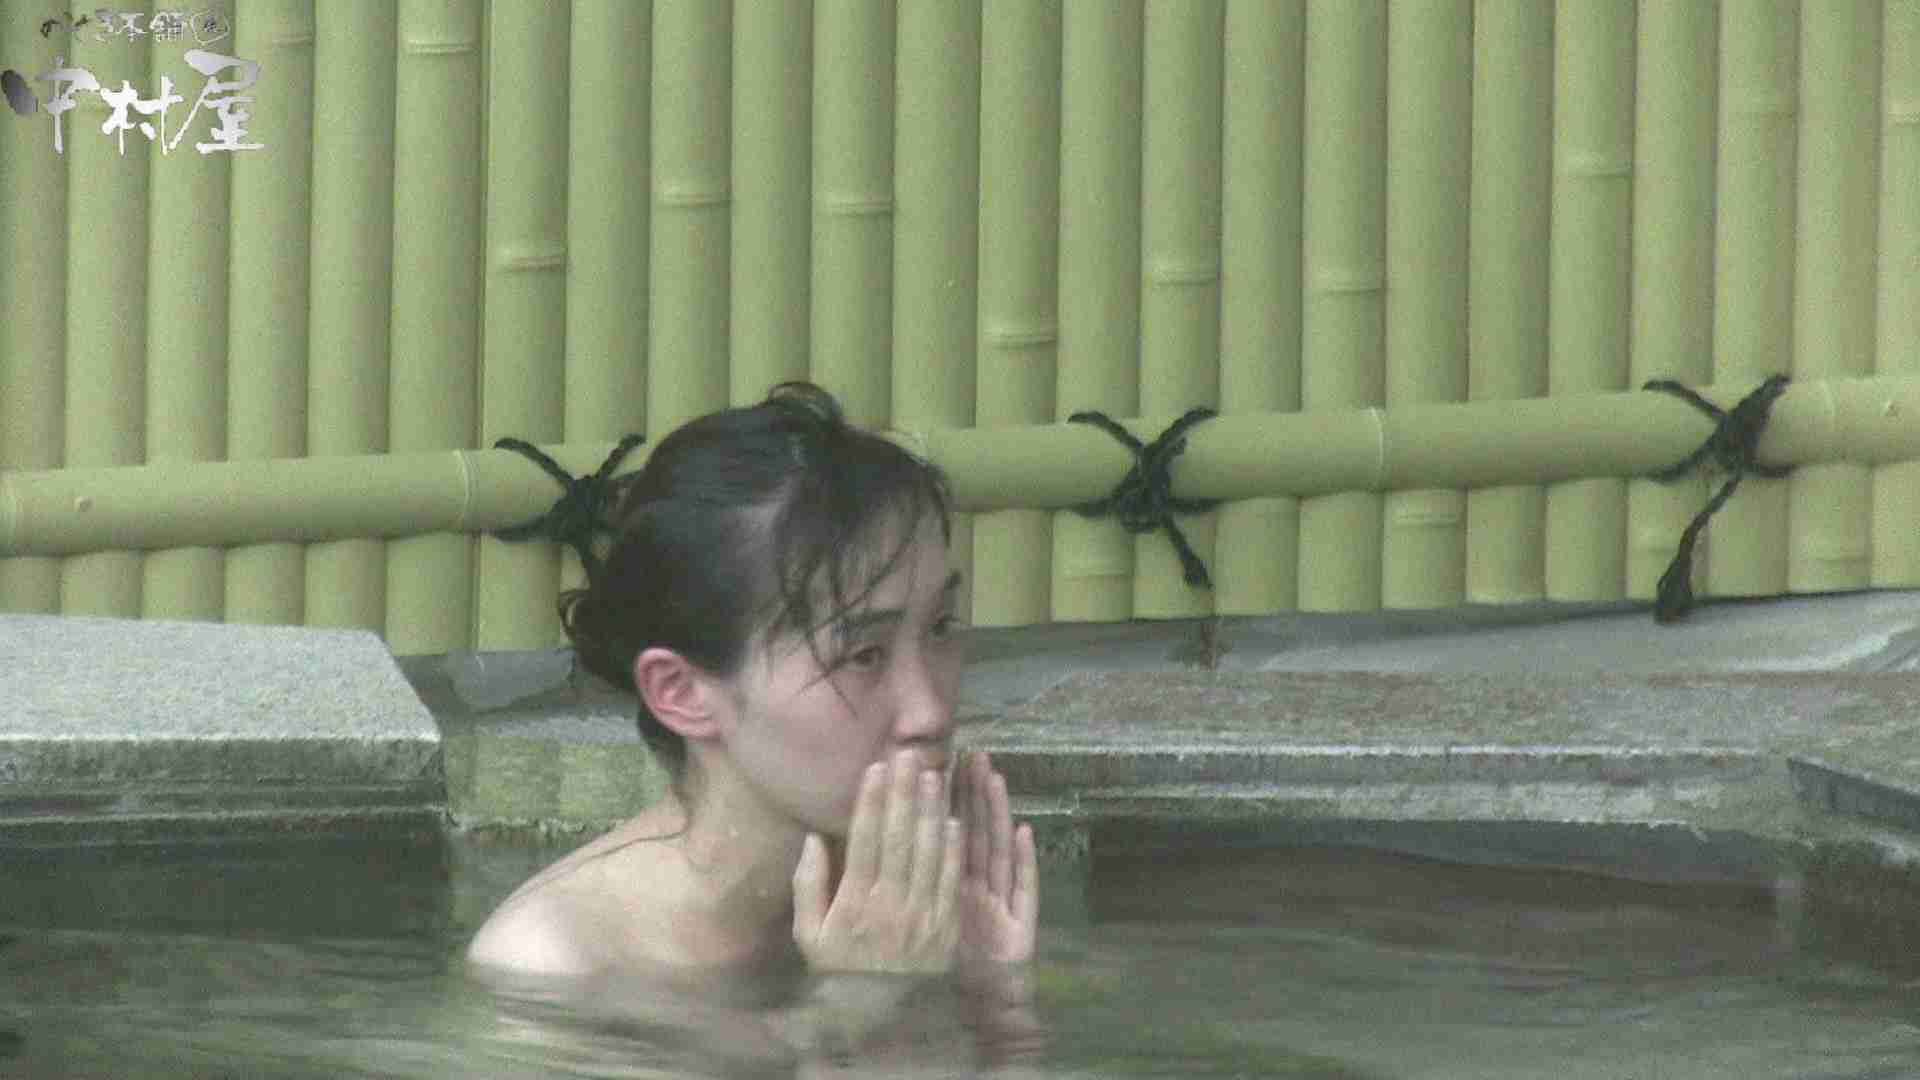 Aquaな露天風呂Vol.910 盗撮シリーズ | 露天風呂編  84PIX 19